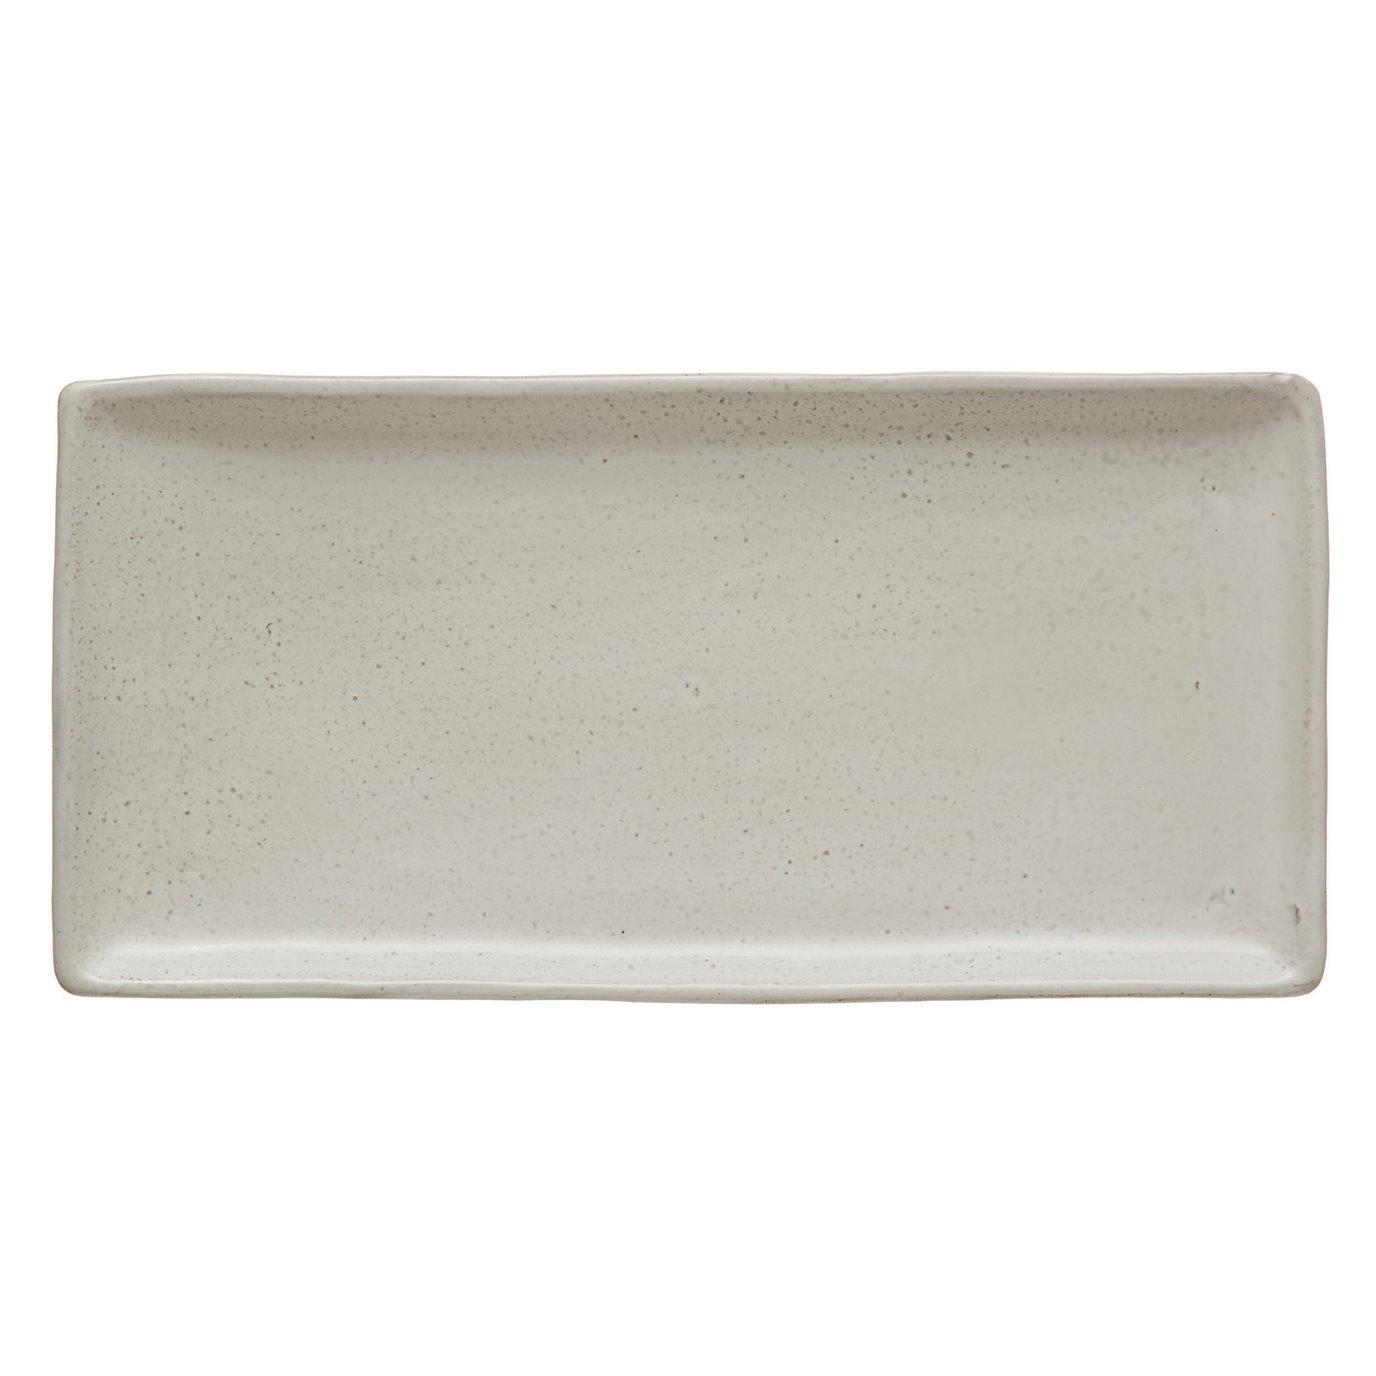 Stoneware Platter, Matte White Finish